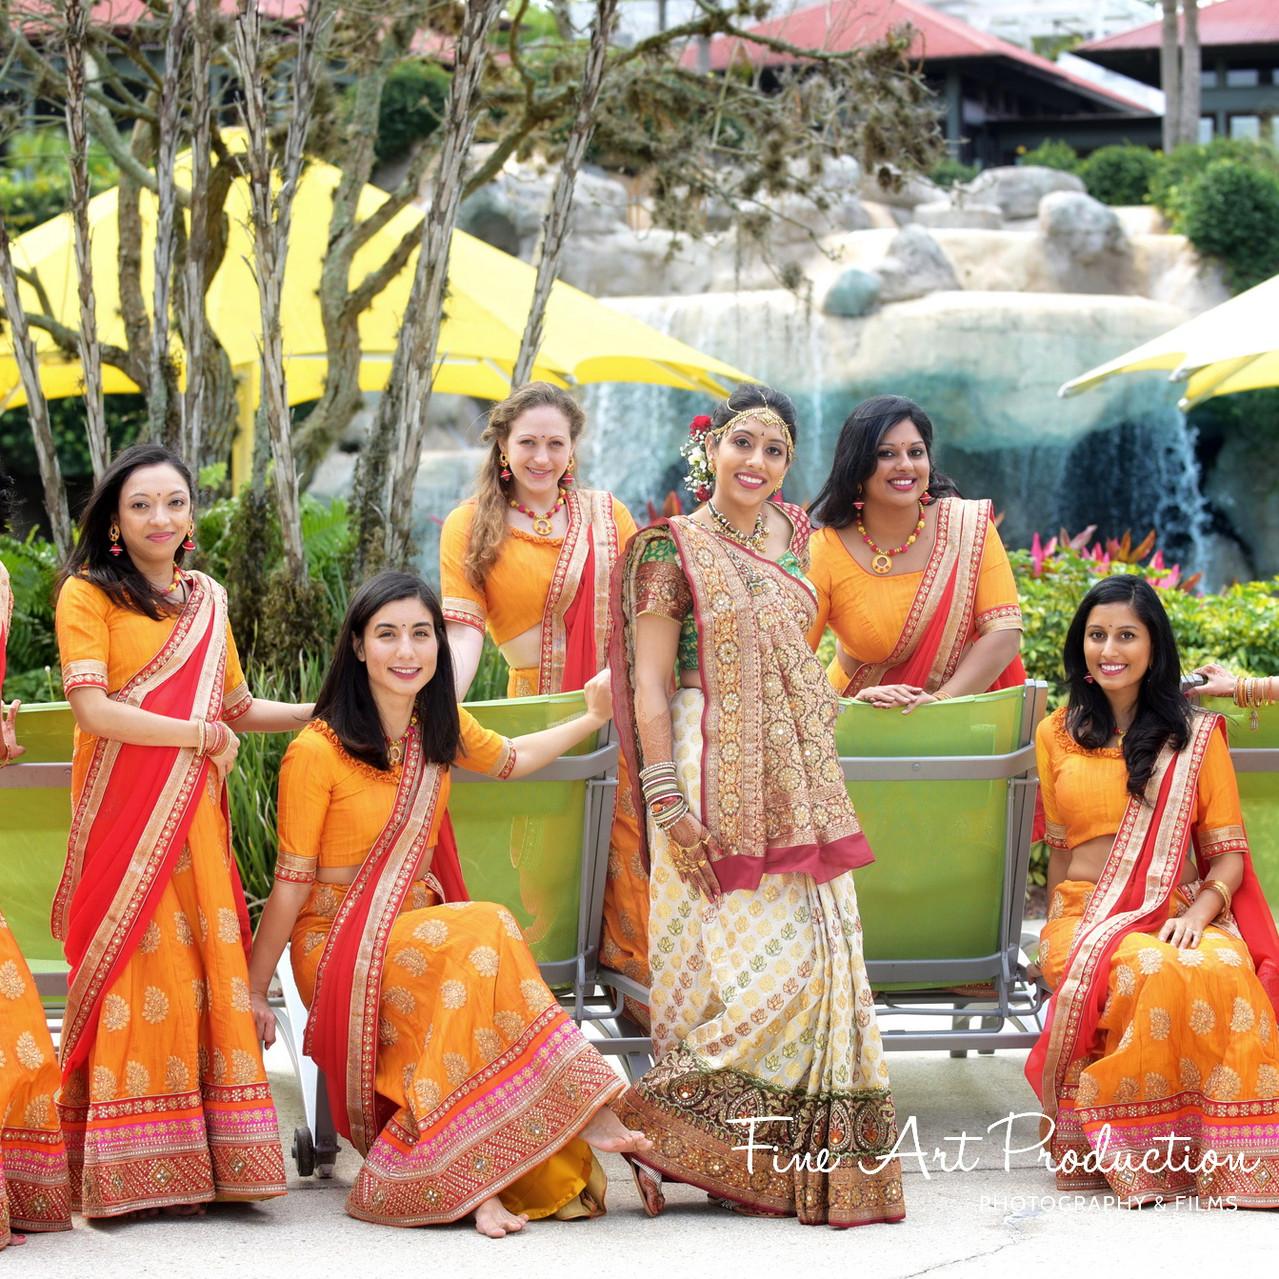 Hyatt-Regency-Grand-Cypress-Indian-Wedding-Photography-Fine-Art-Production-Amish-Thakkar_30